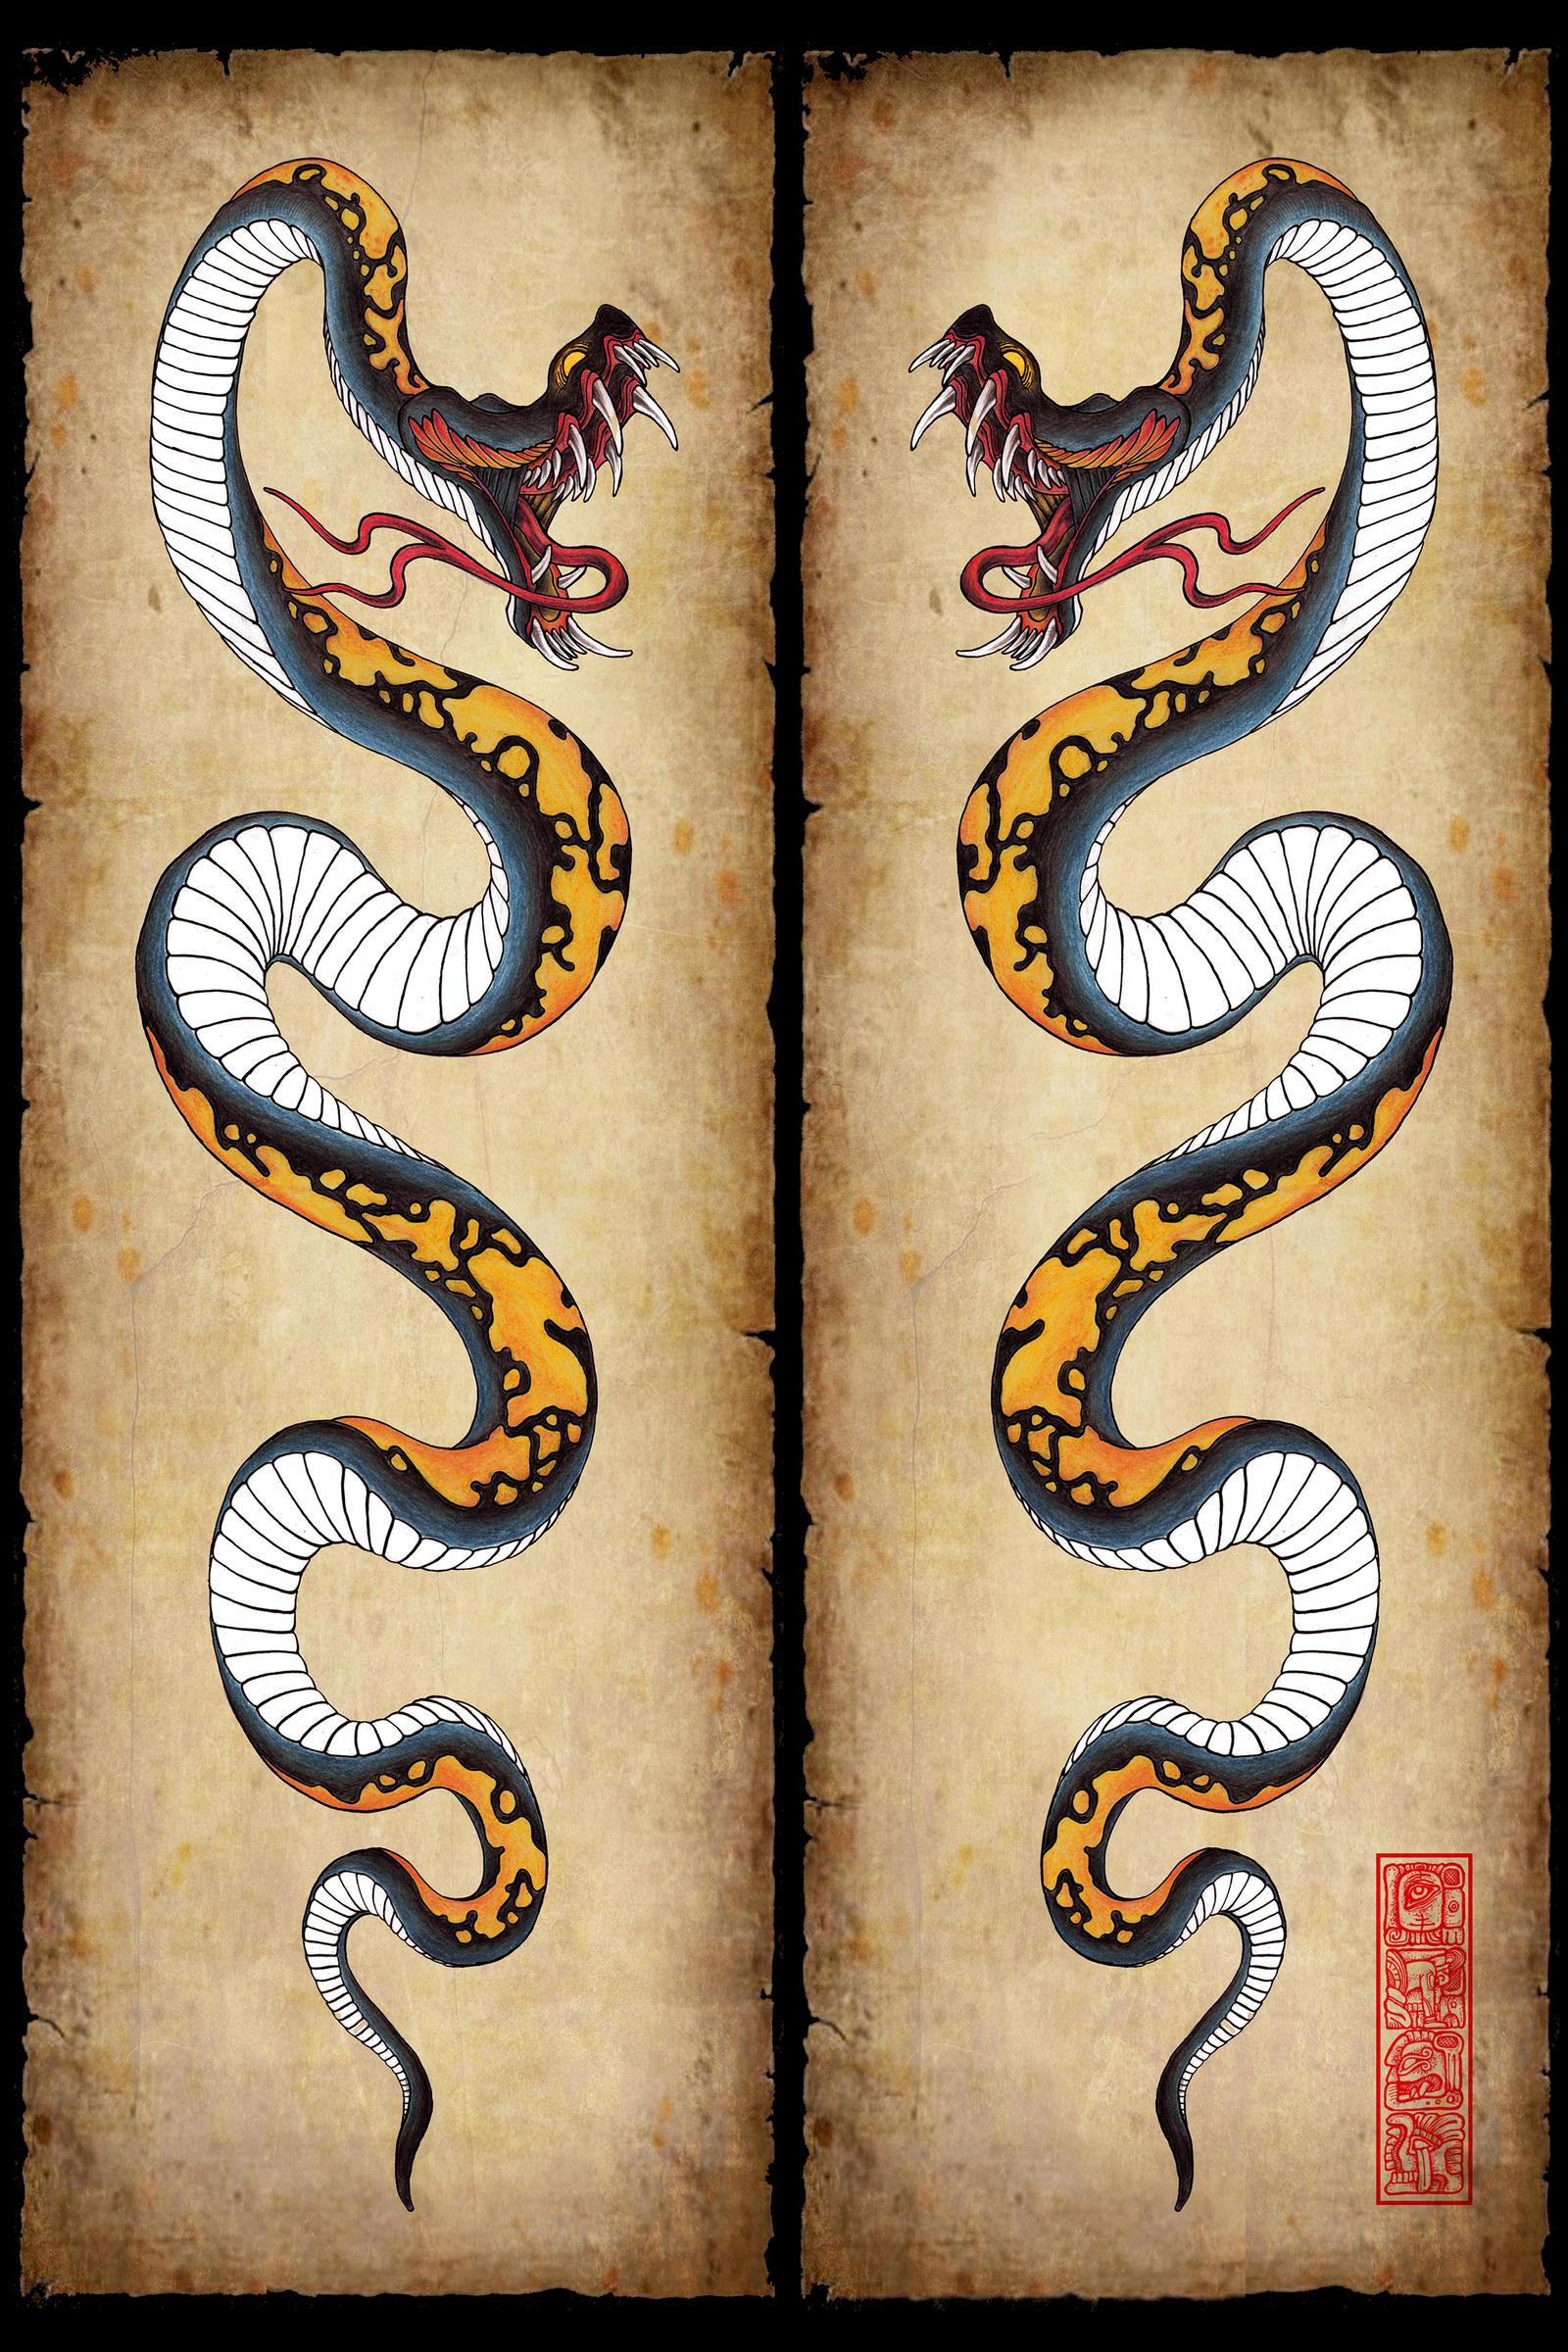 Snake Tattoo Design By Burke5 On DeviantArt